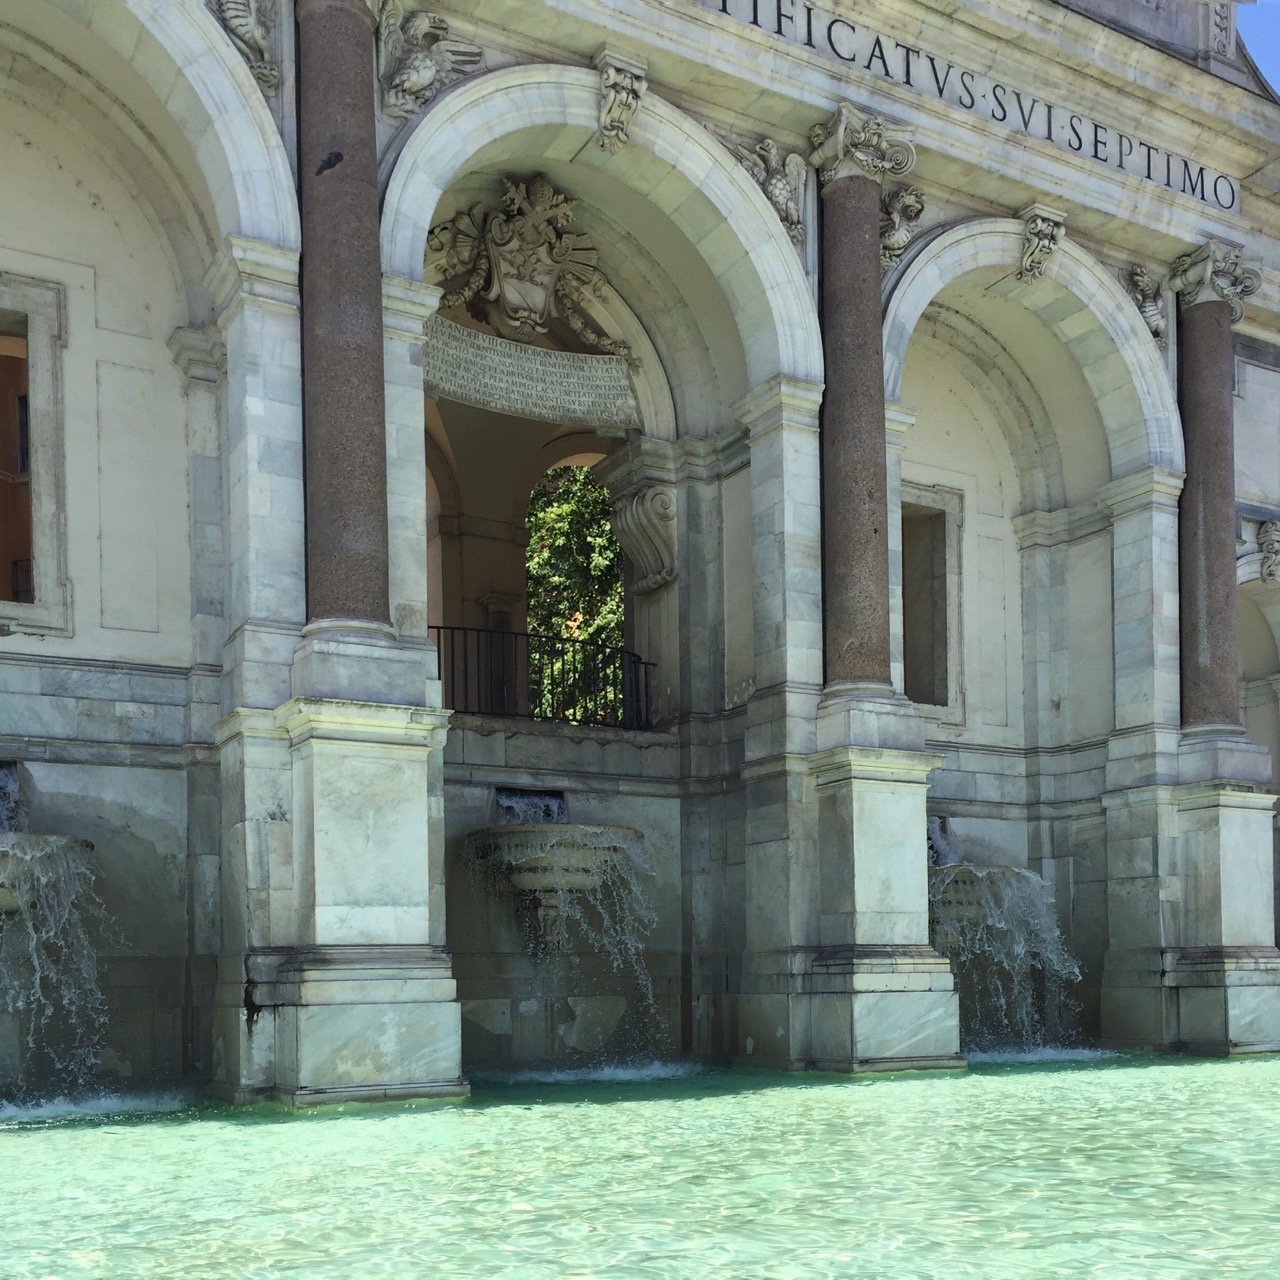 fontanone on gianicolo in rome